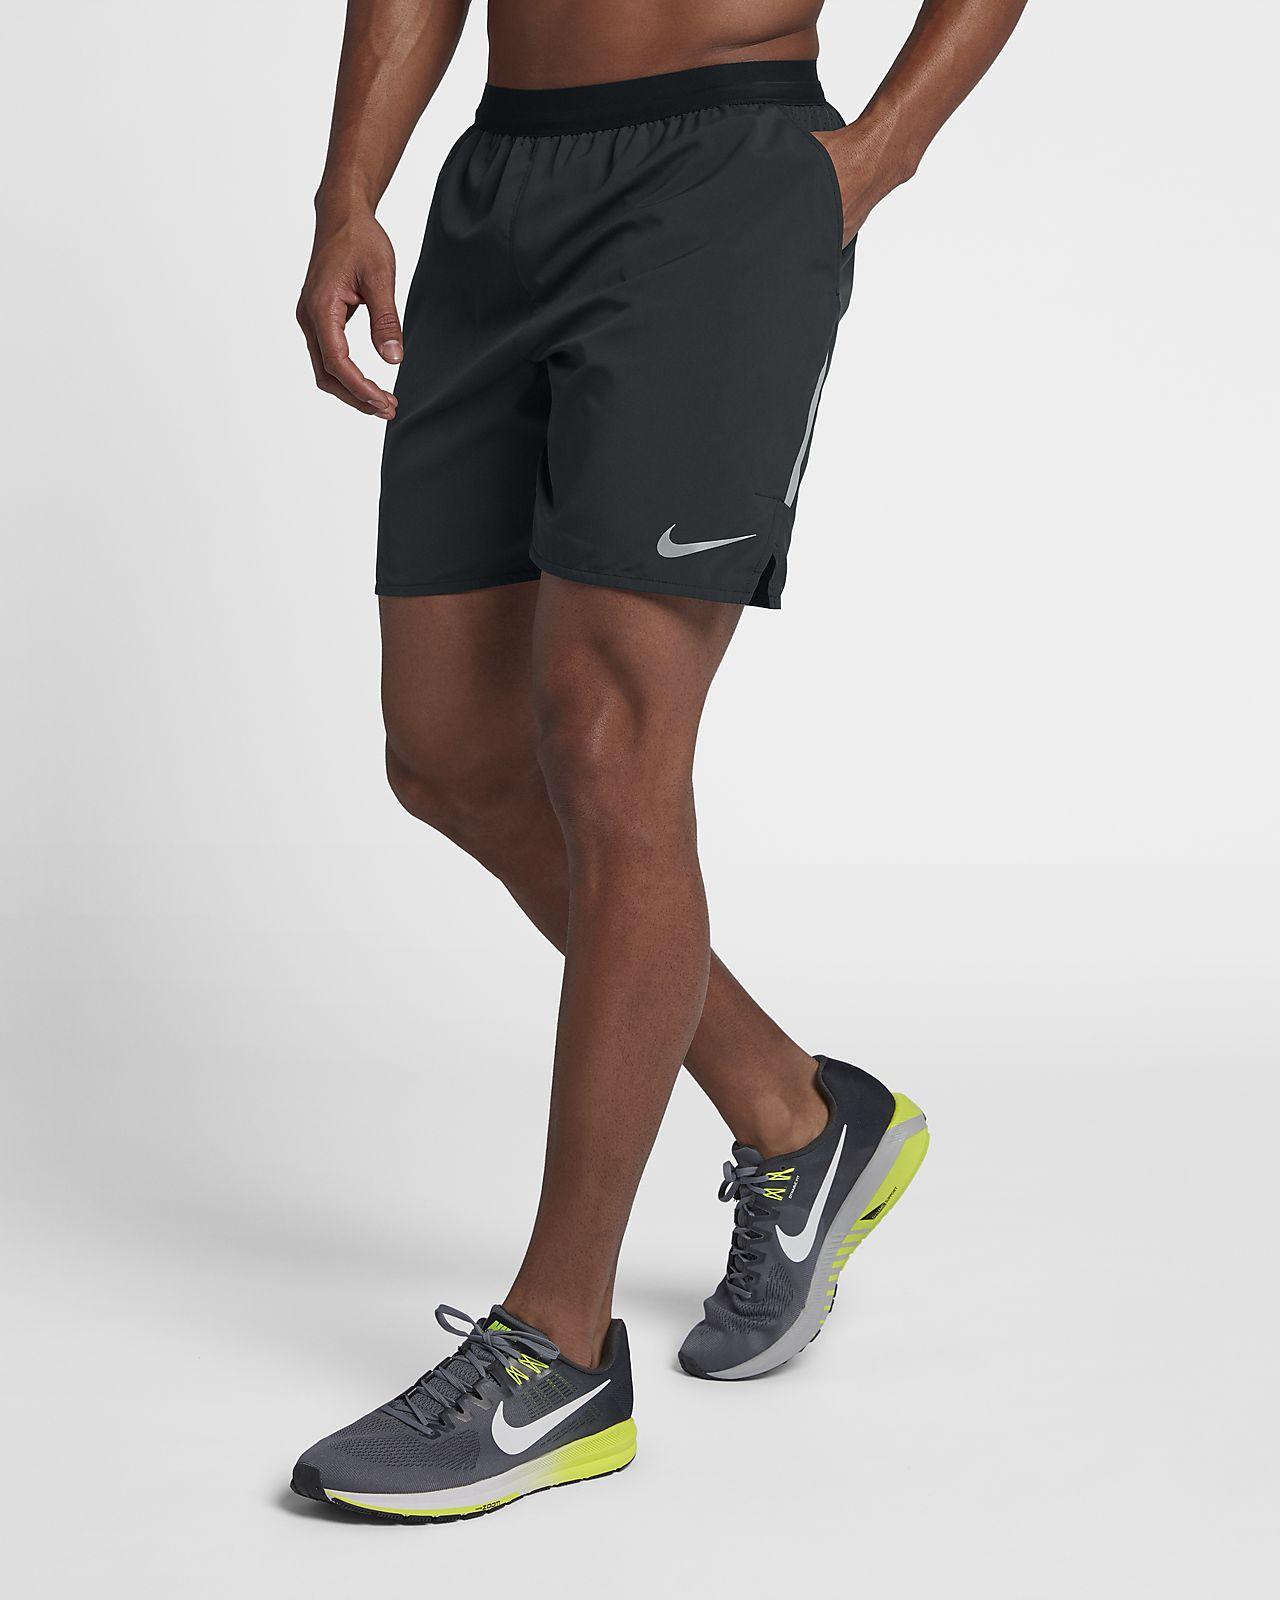 Nike Distance Men 7